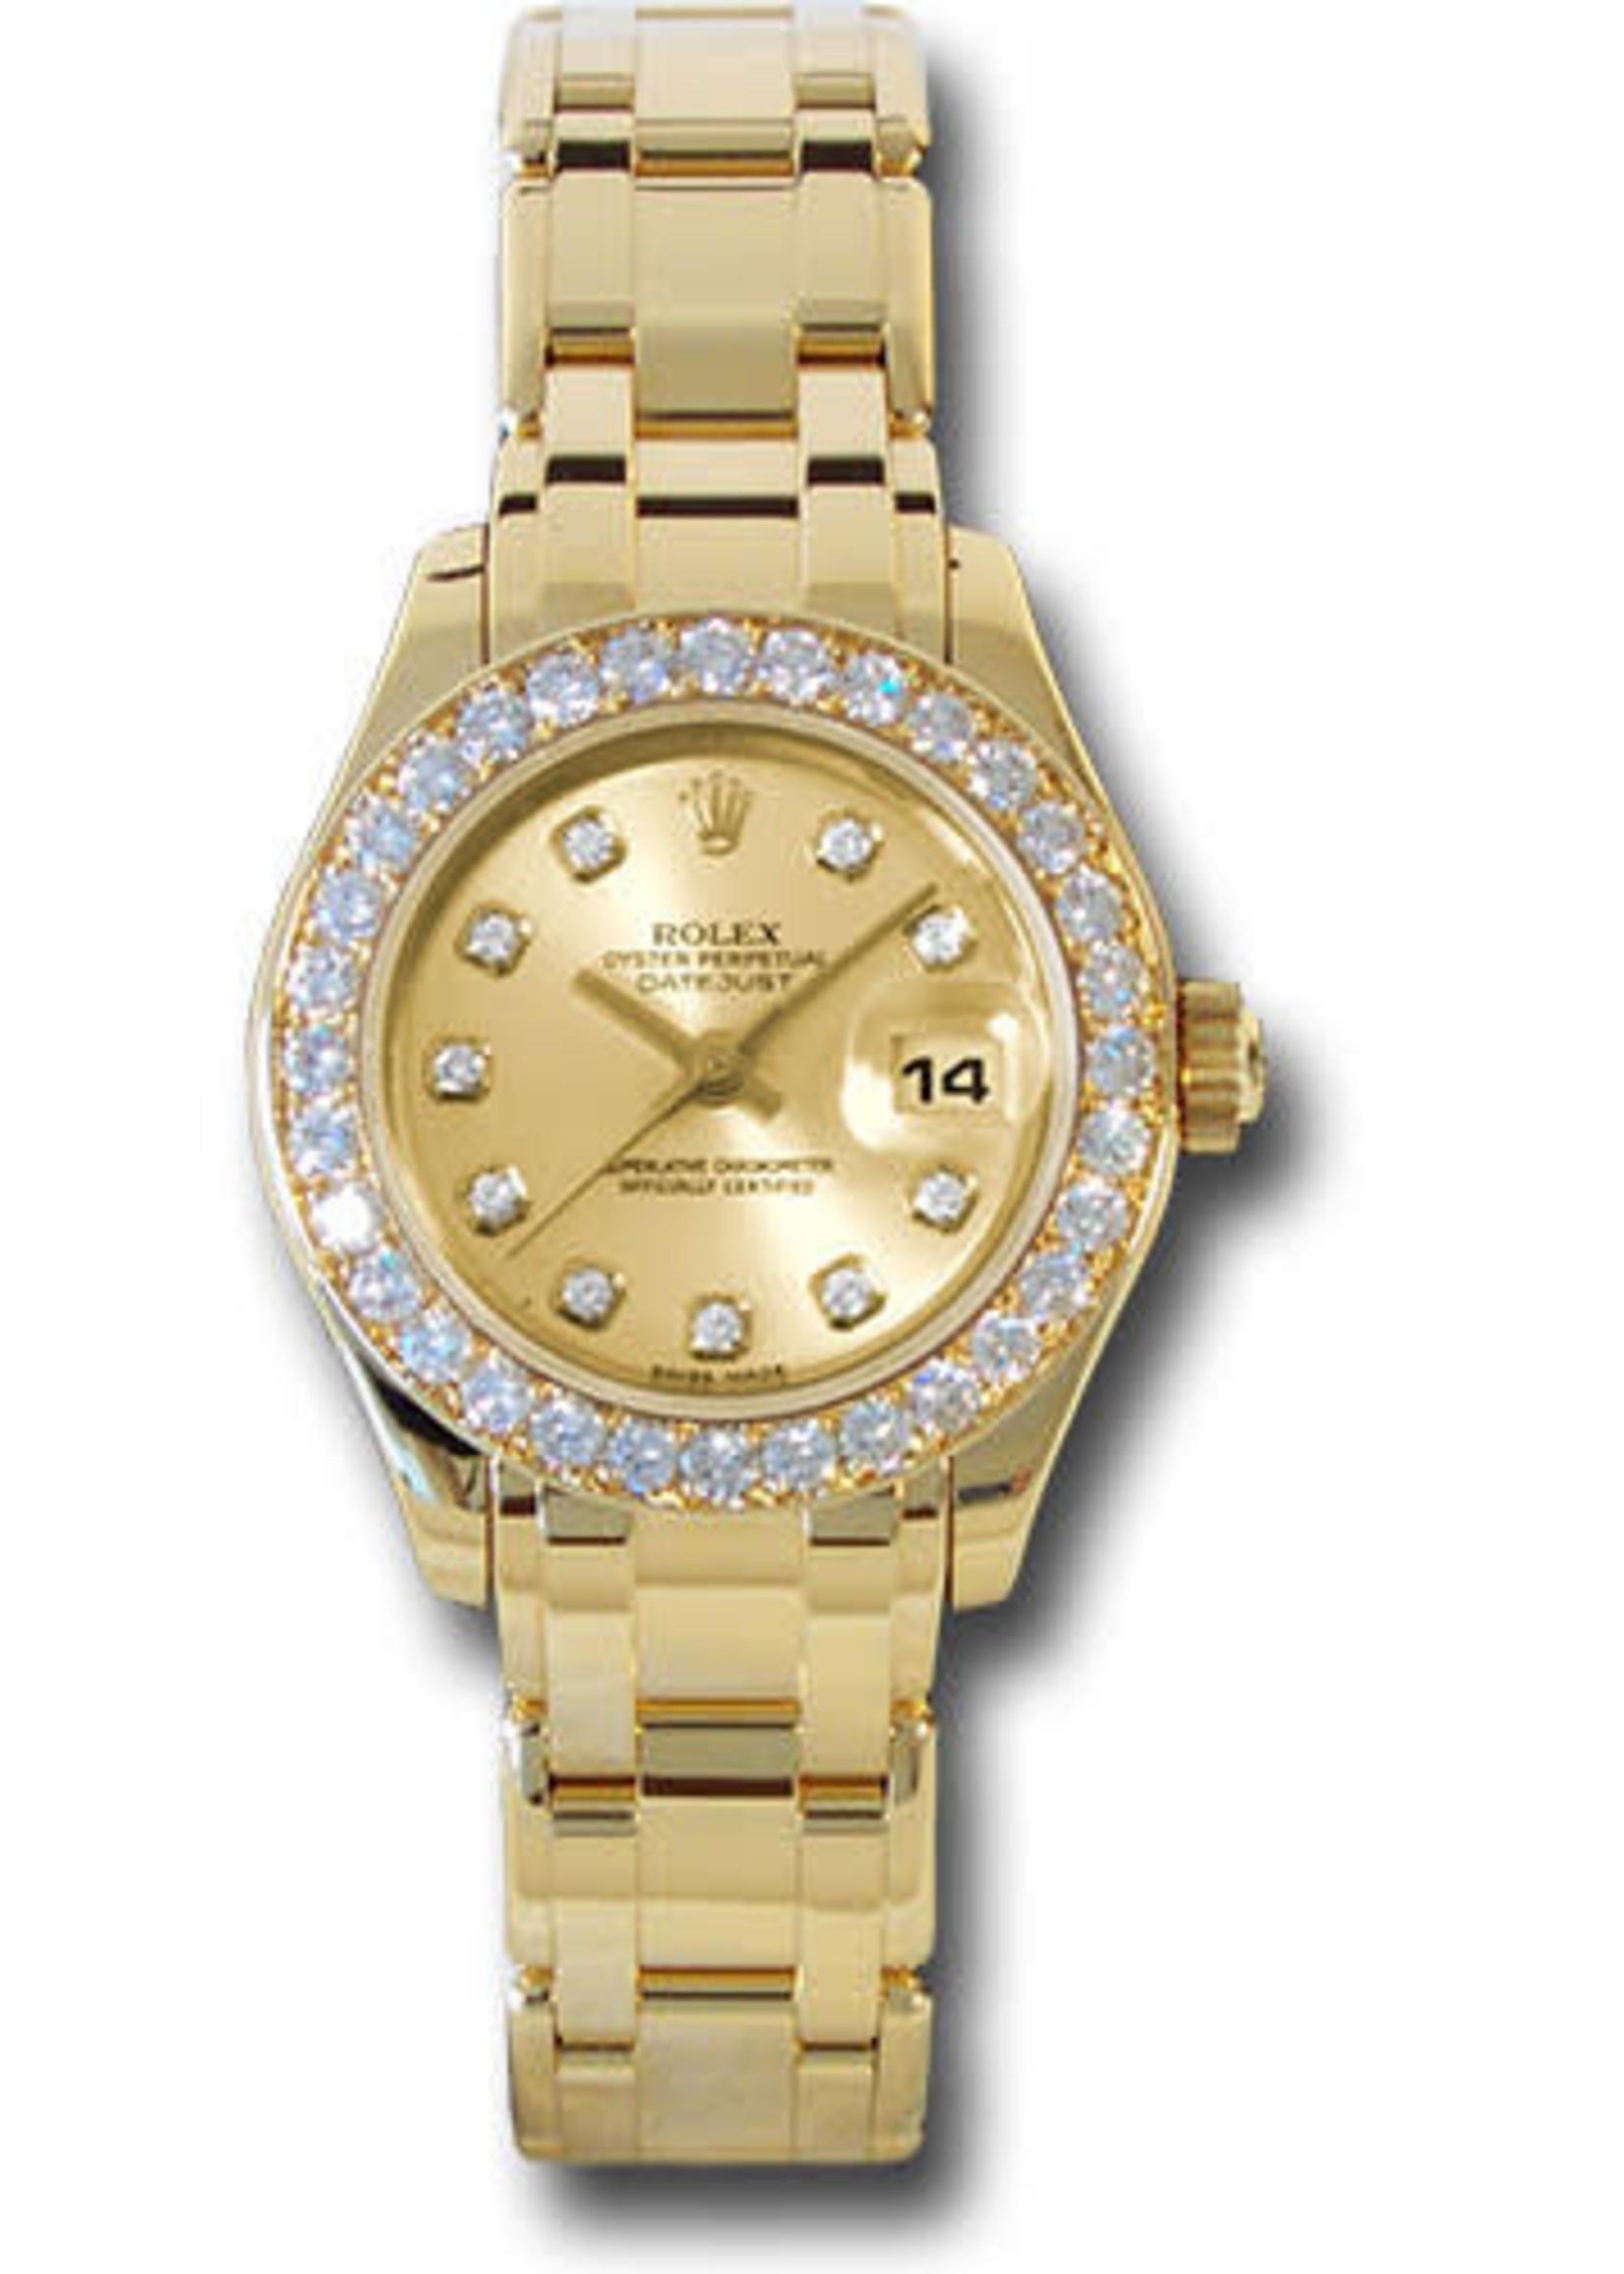 Rolex ROLEX DATEJUST PEARLMASTER 29MM #80318 (2000)